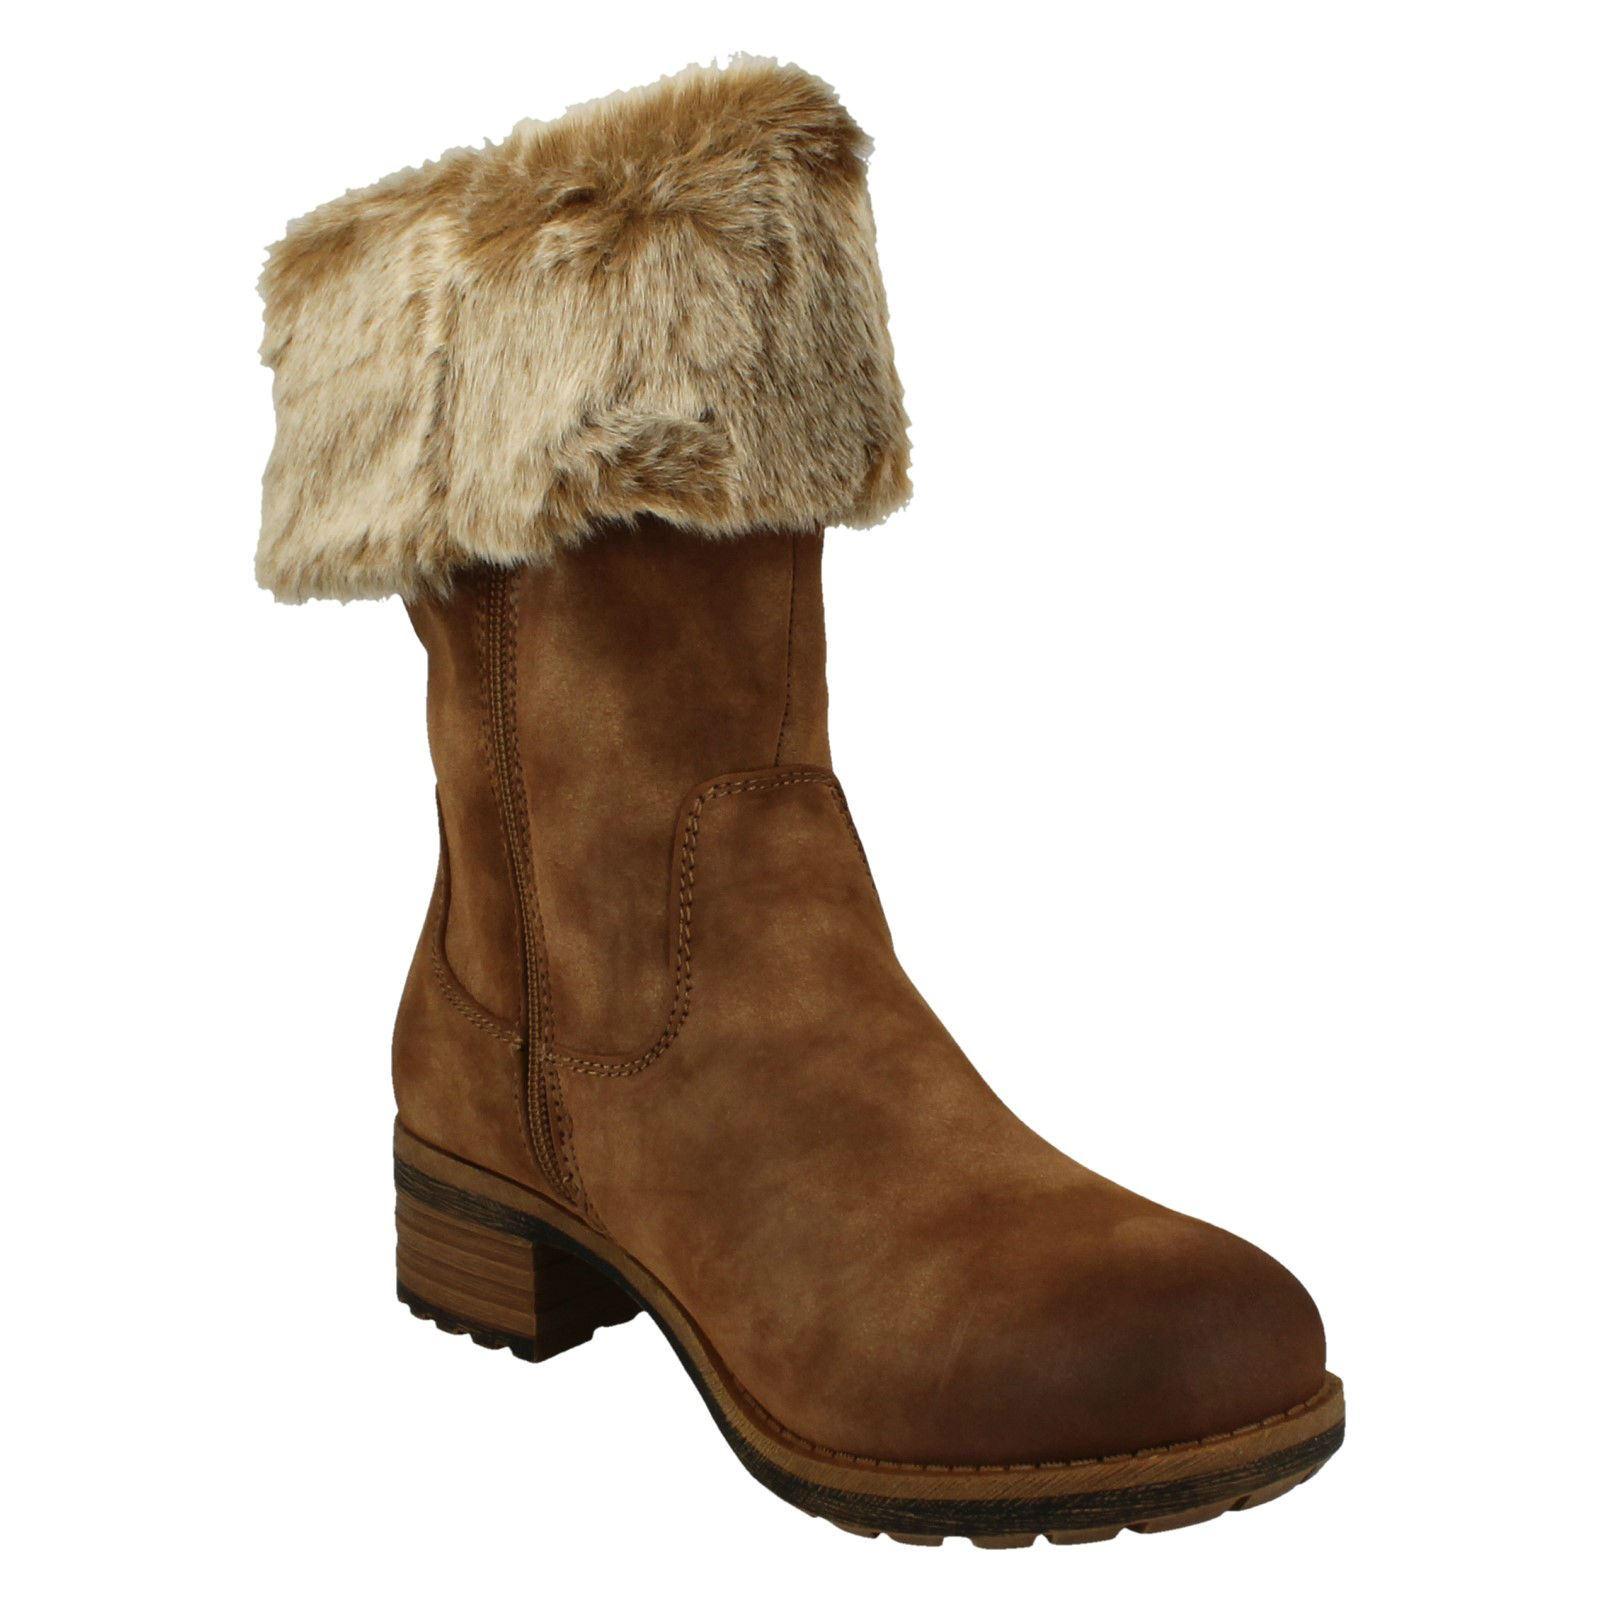 botas 96854 Para Mujer Rieker-Zip Up 96854 botas e09298